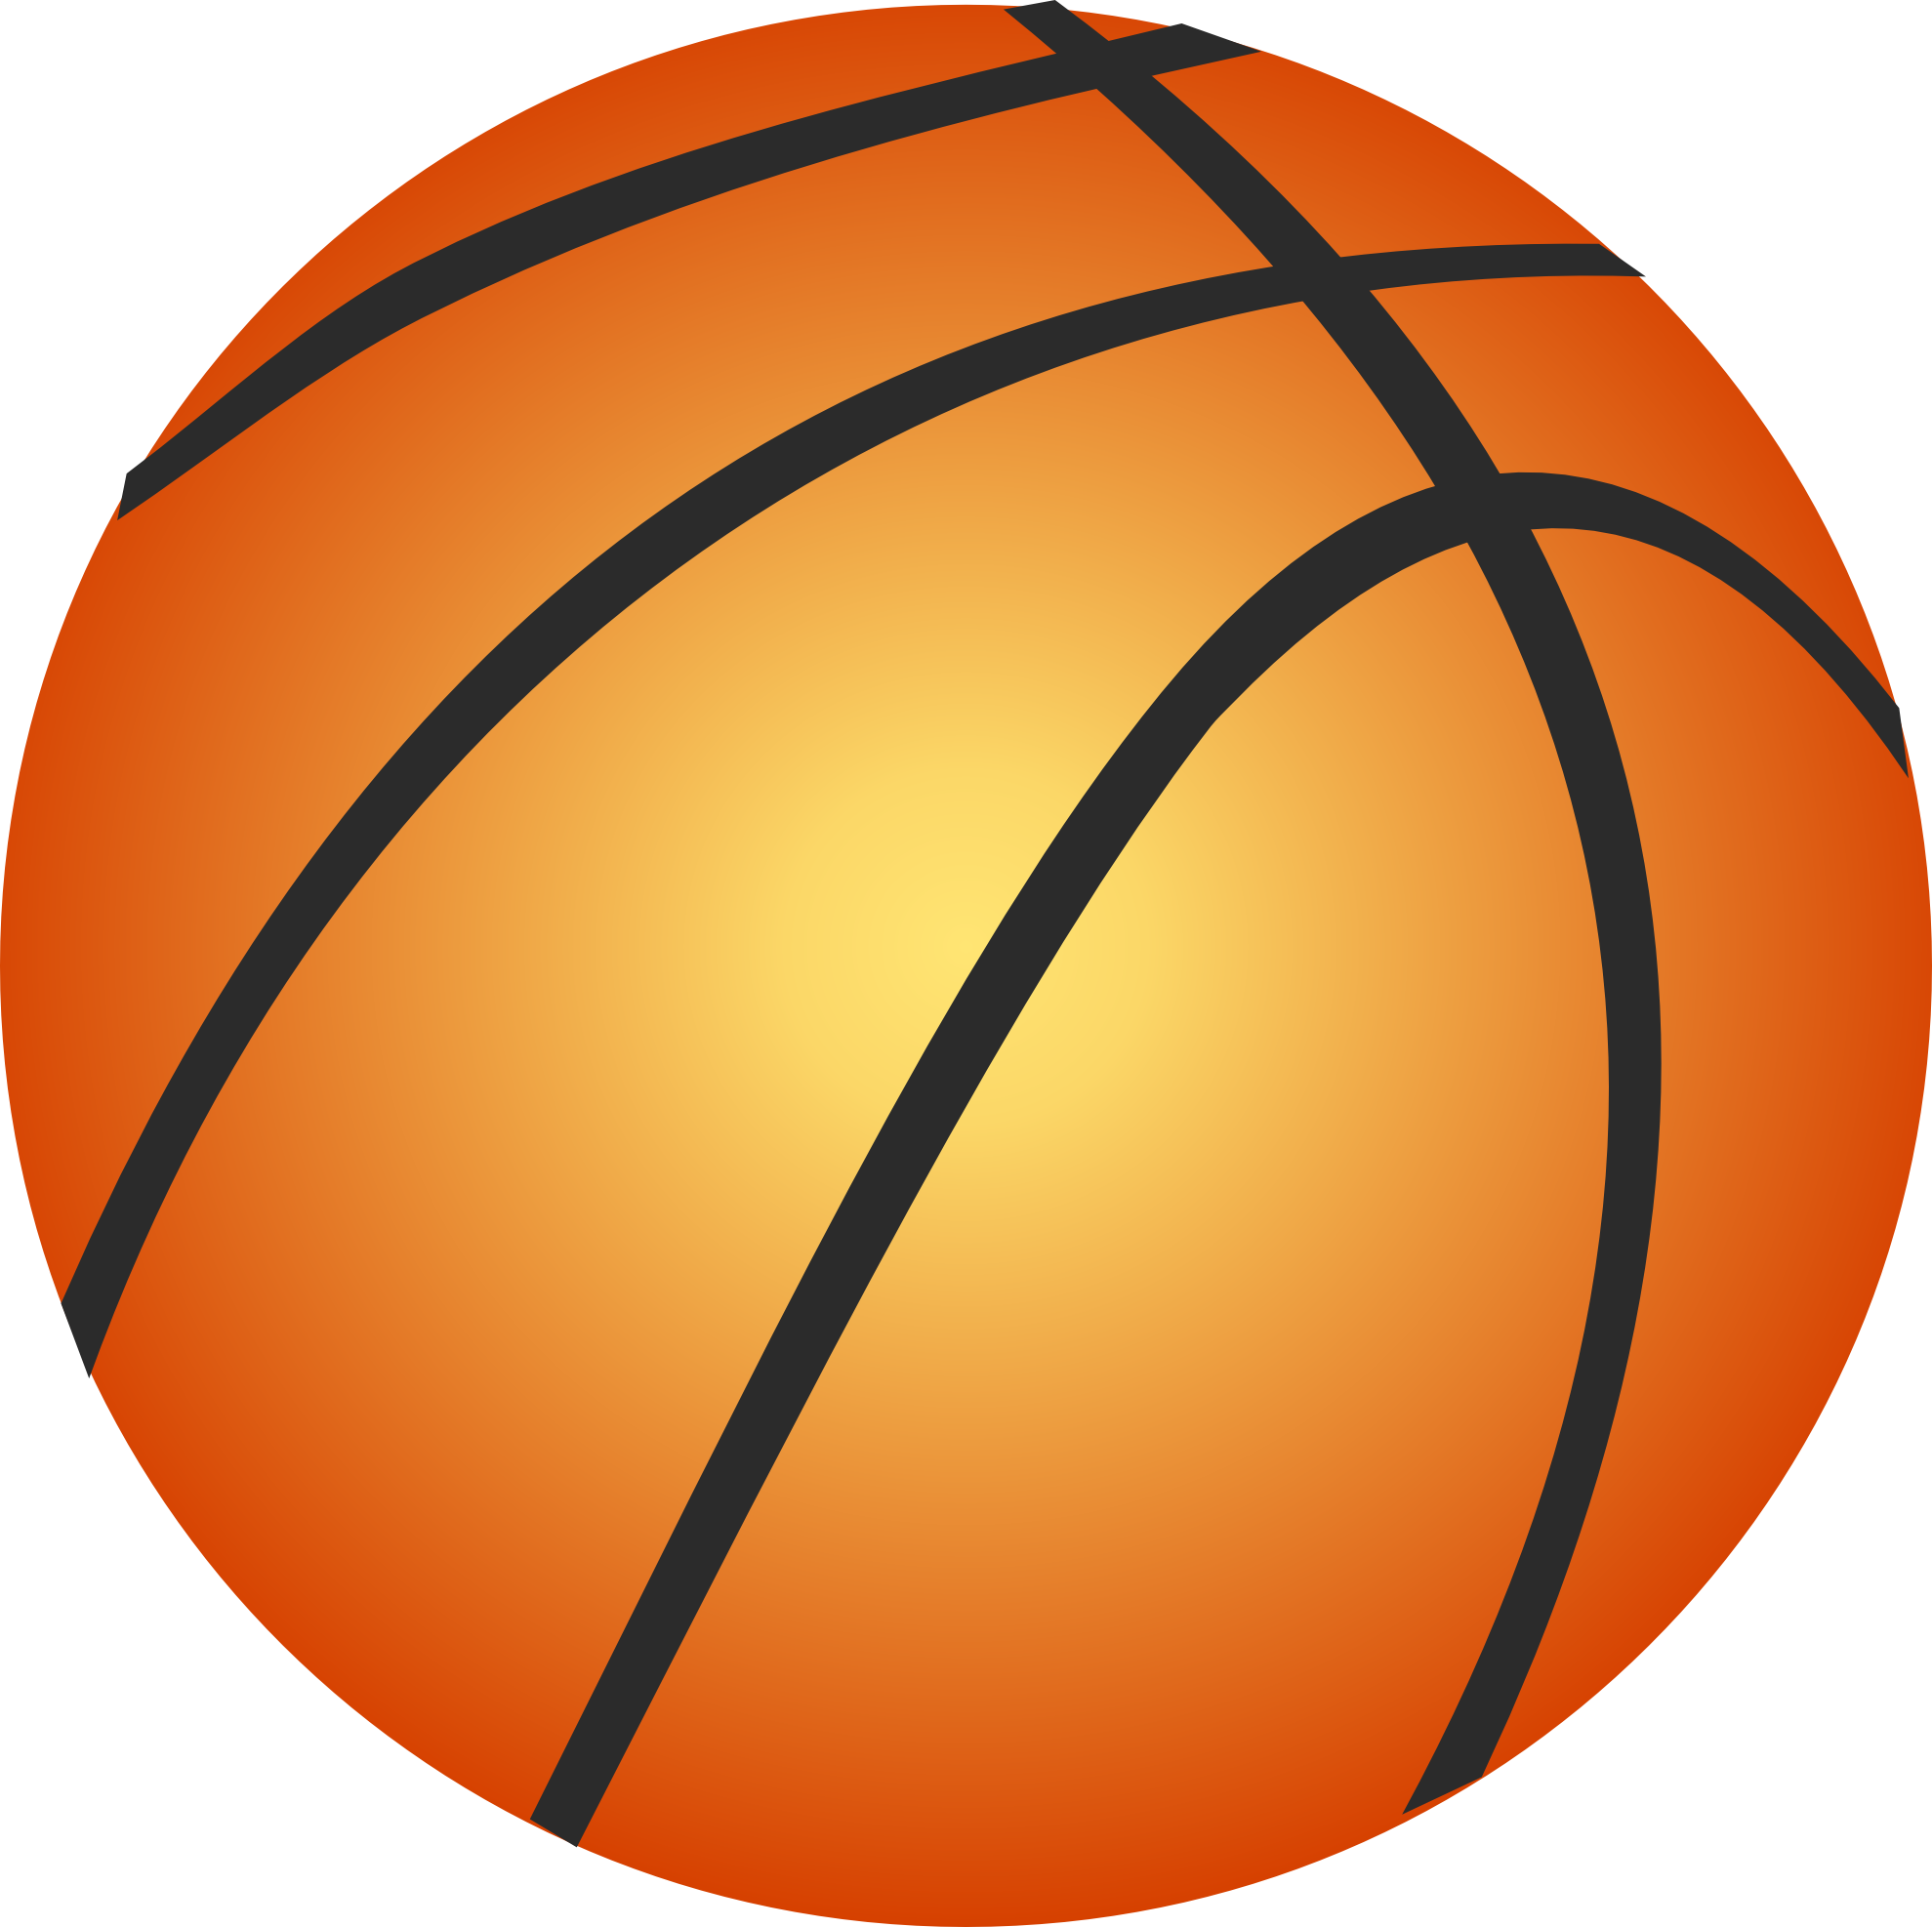 Basketball Basket Png image #39958